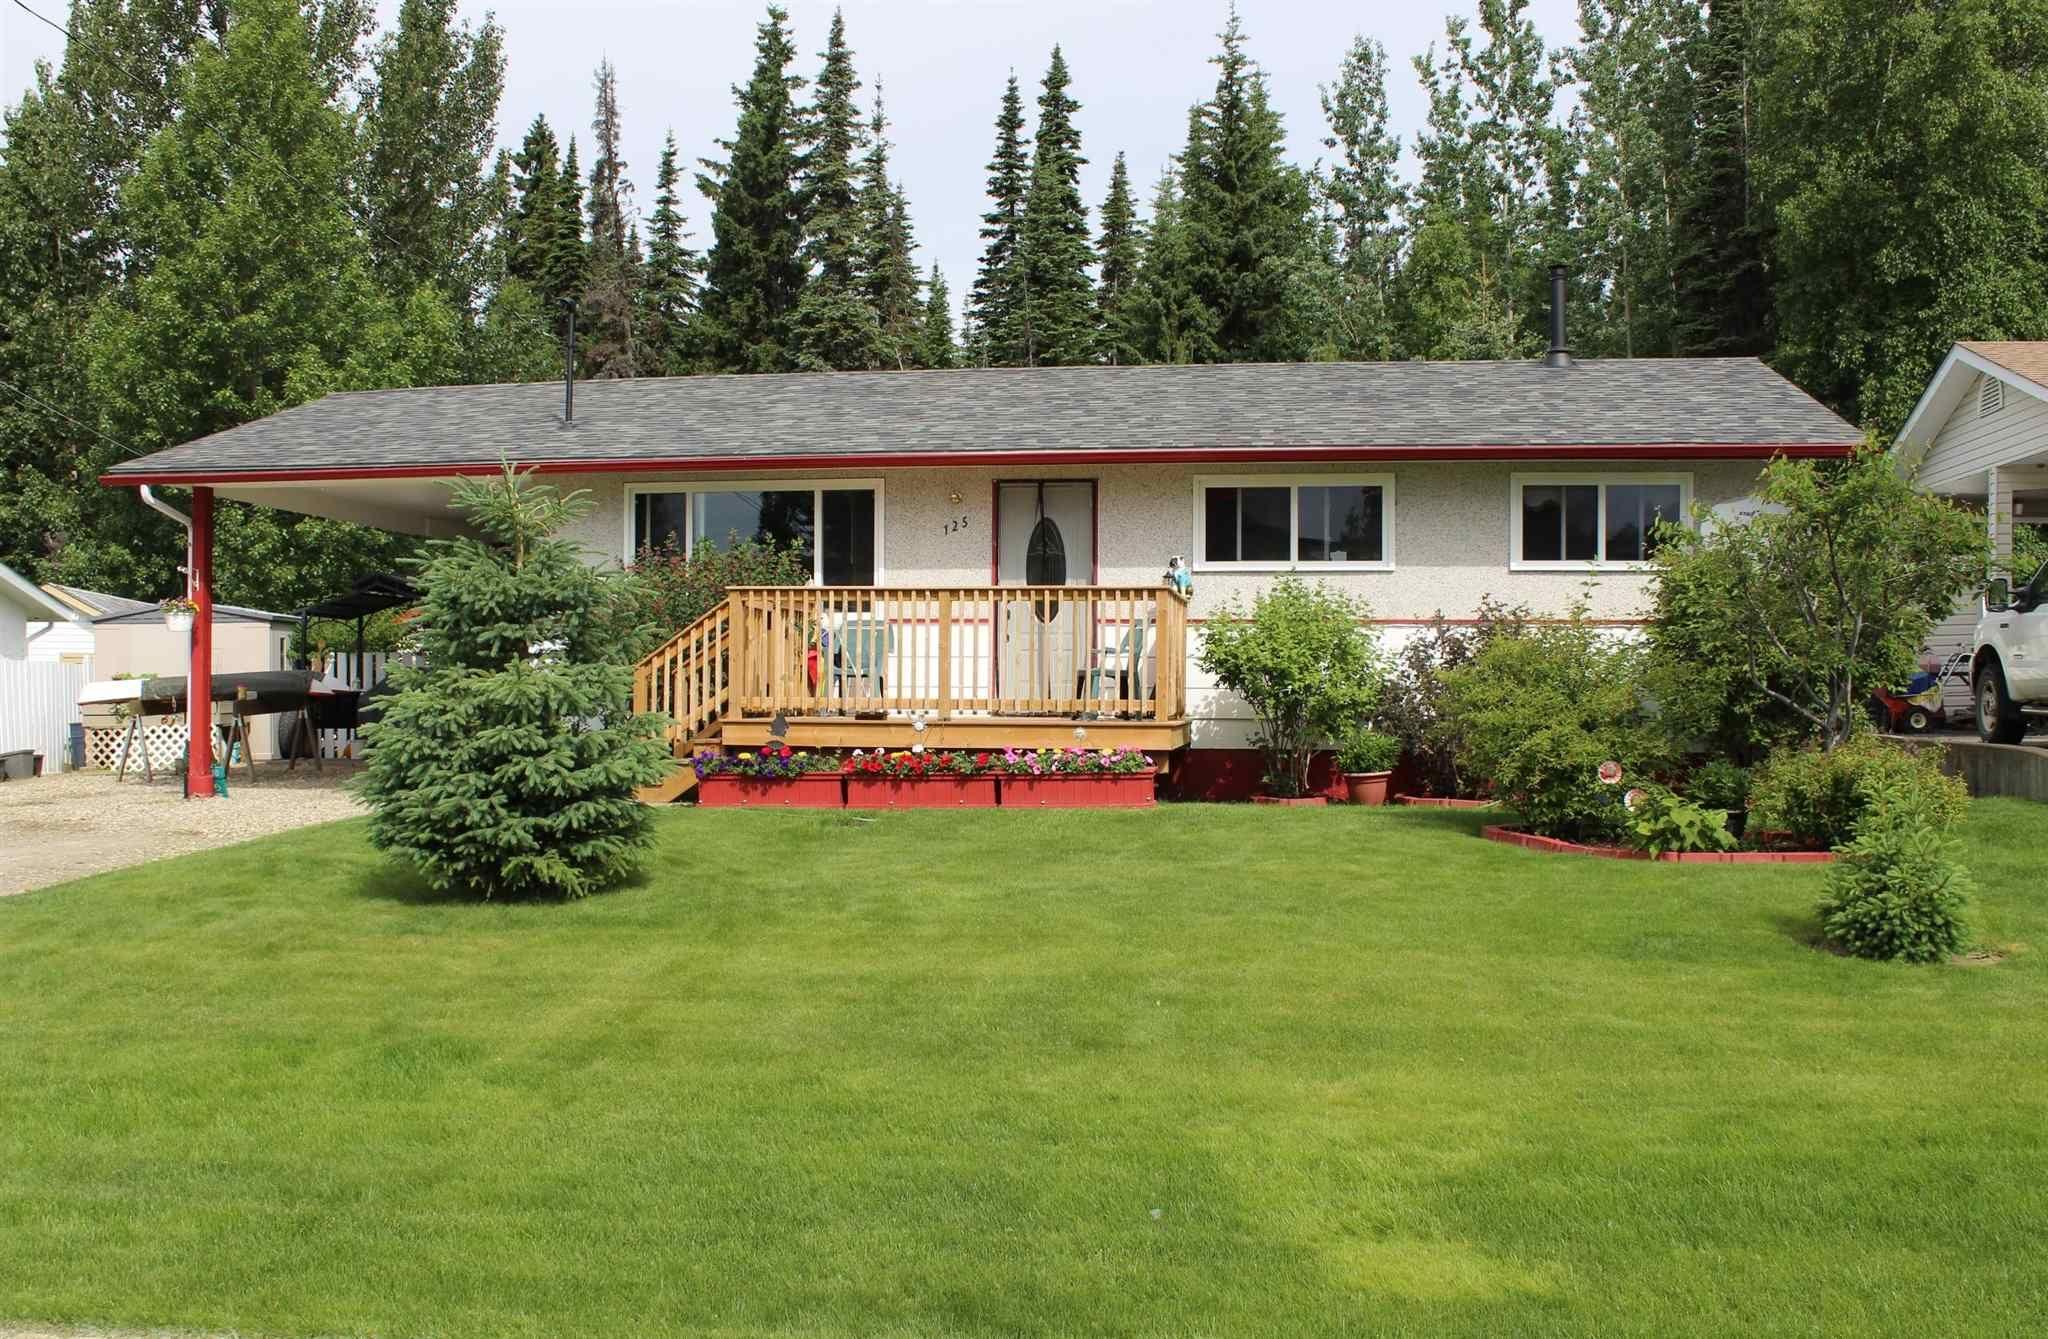 Main Photo: 125 SUMMIT Crescent in Mackenzie: Mackenzie -Town House for sale (Mackenzie (Zone 69))  : MLS®# R2596173